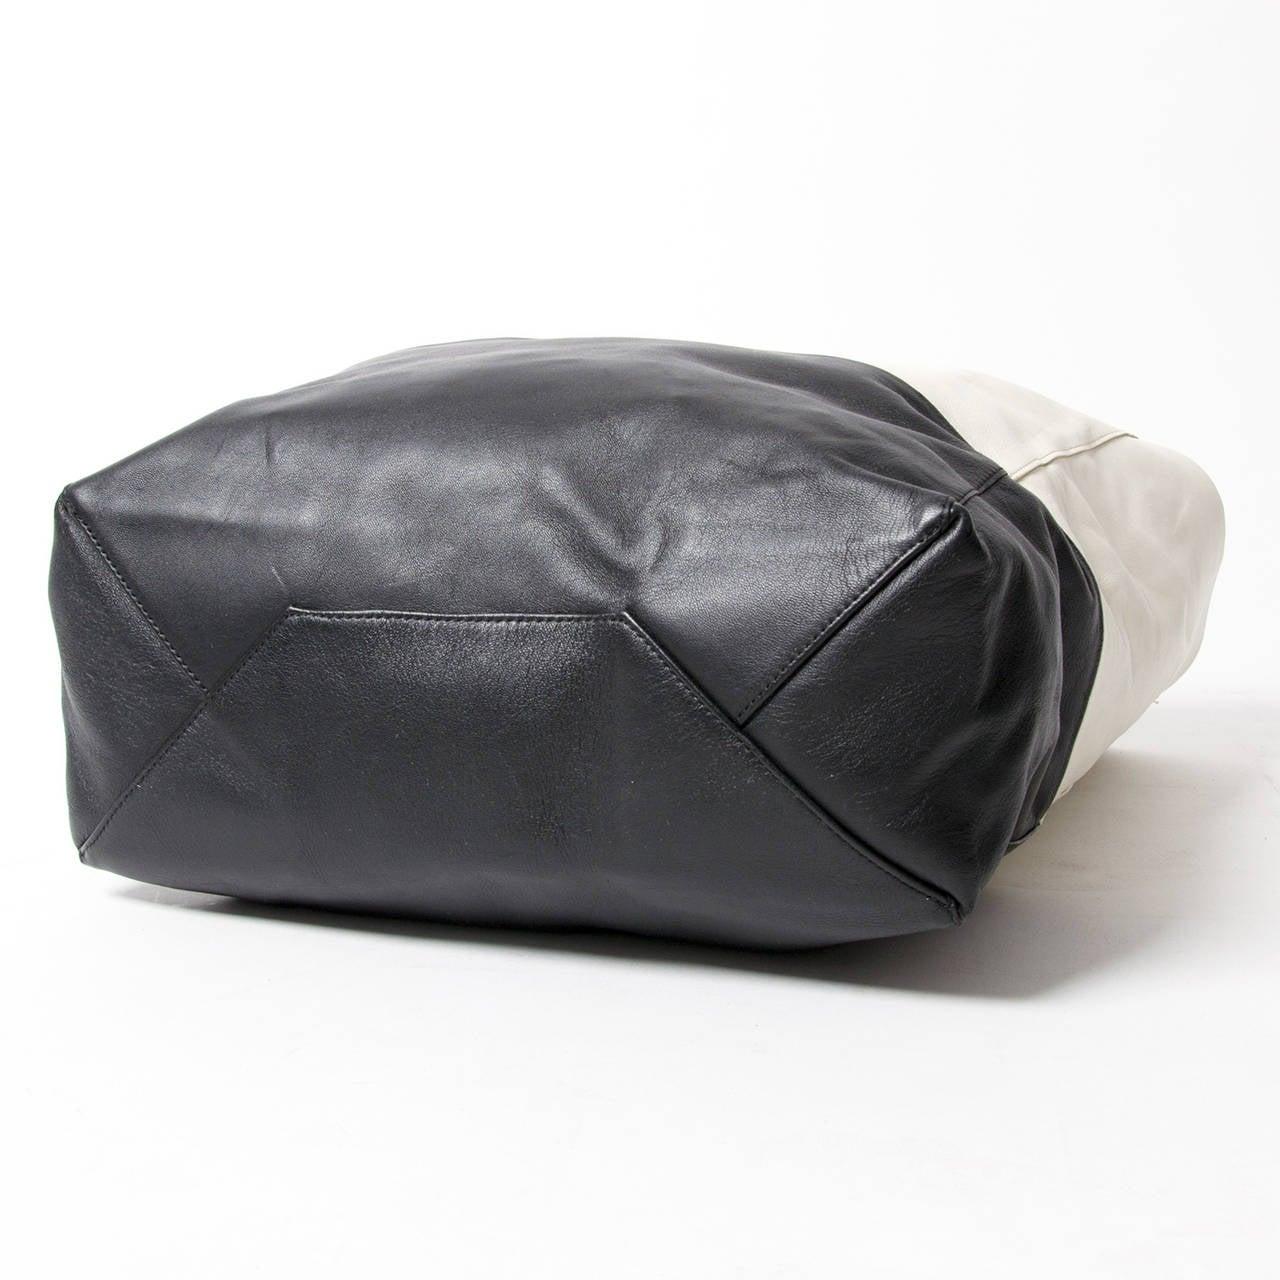 celine sale bags - celine cabas cloth tote